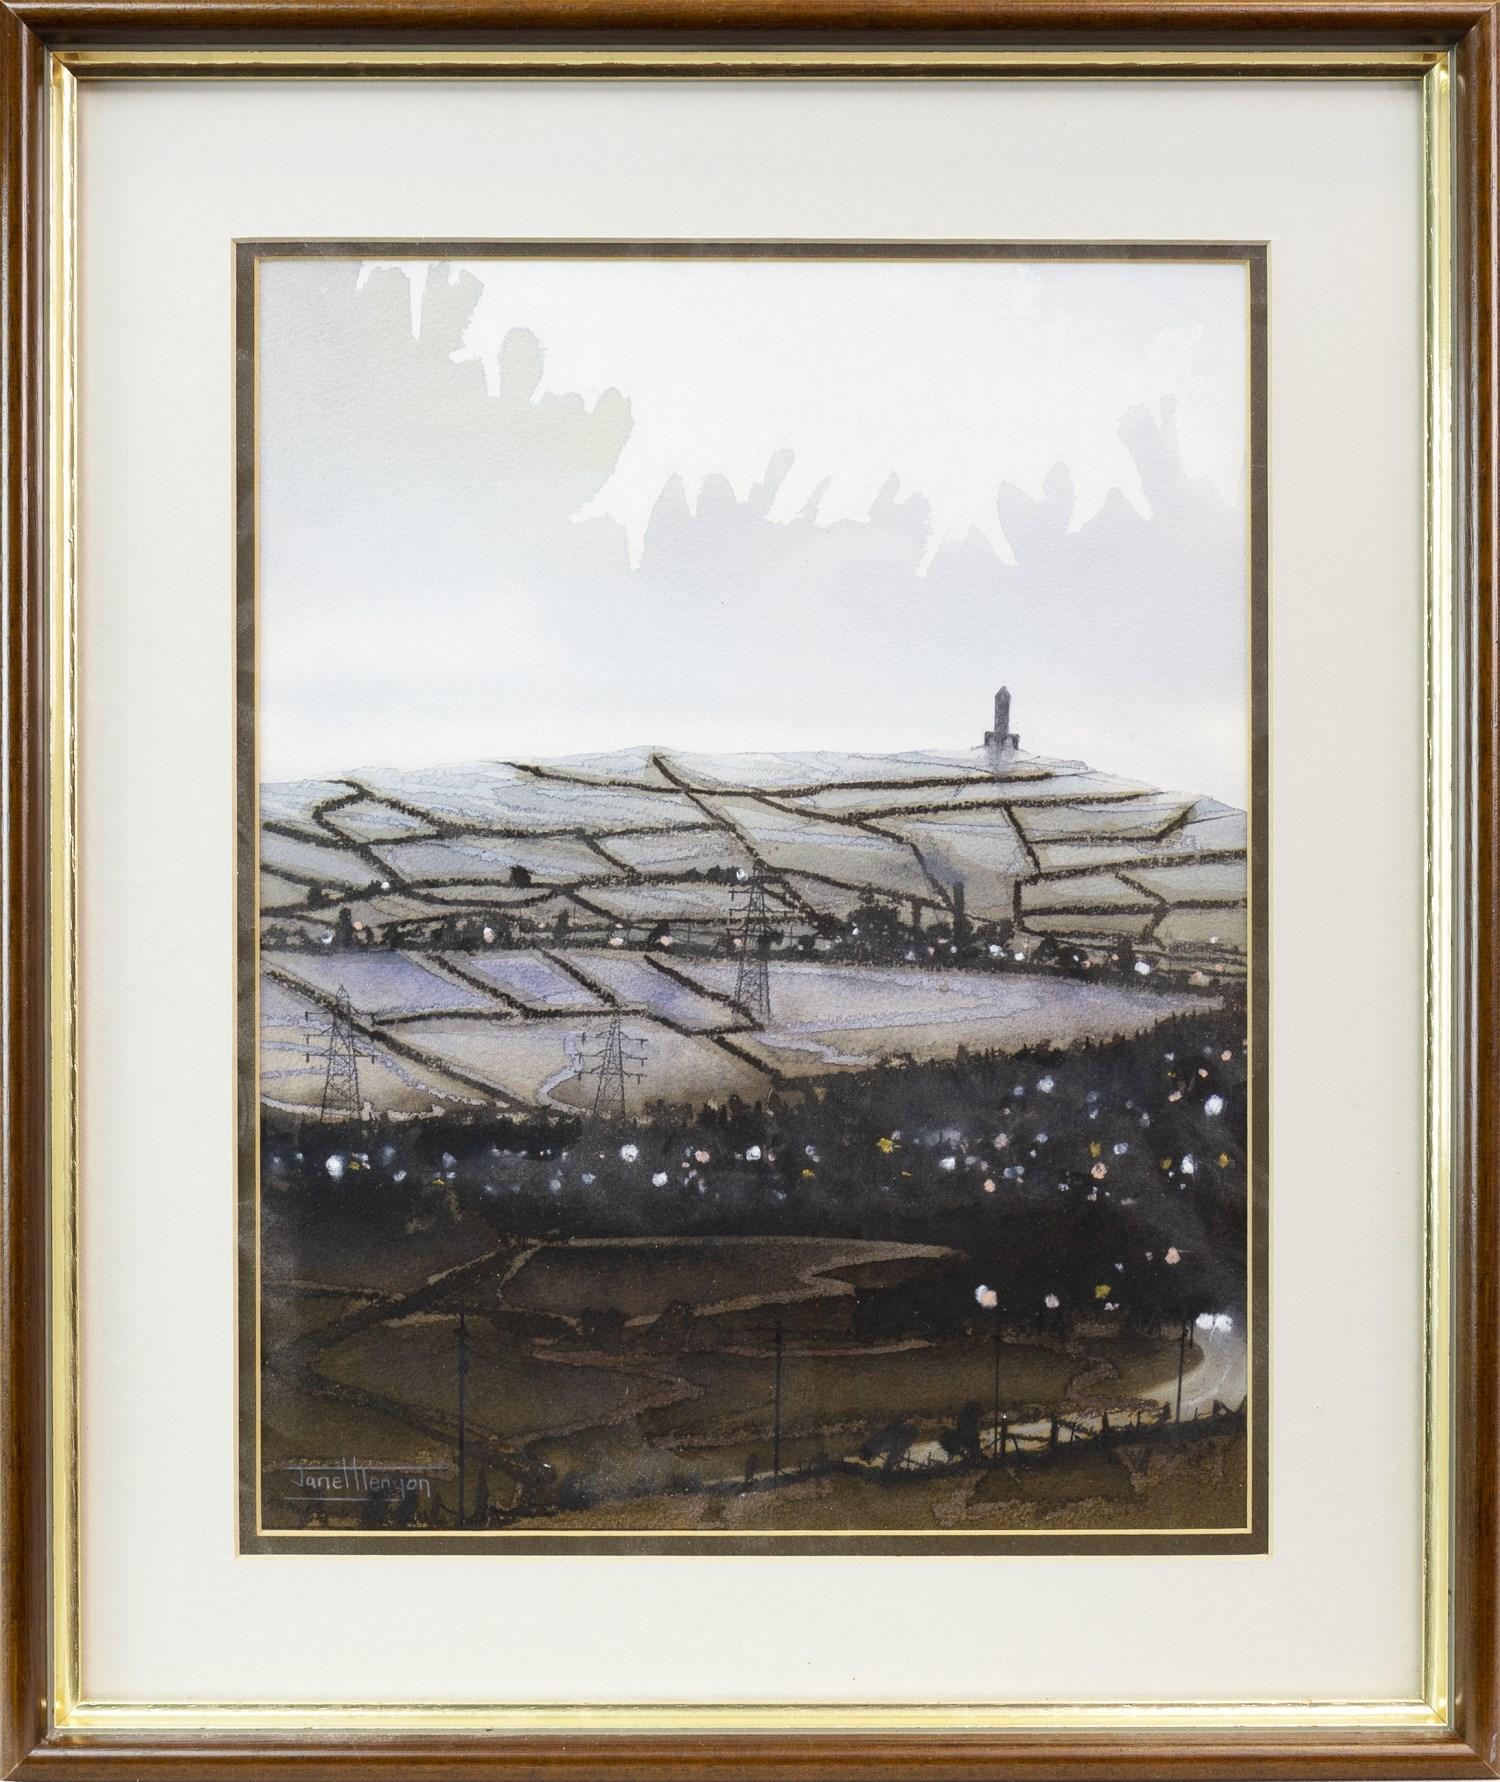 Lot 22 - DARWEN TOWER FROM EGERTON MOORS, A WATERCOLOUR BY JANET KENYON